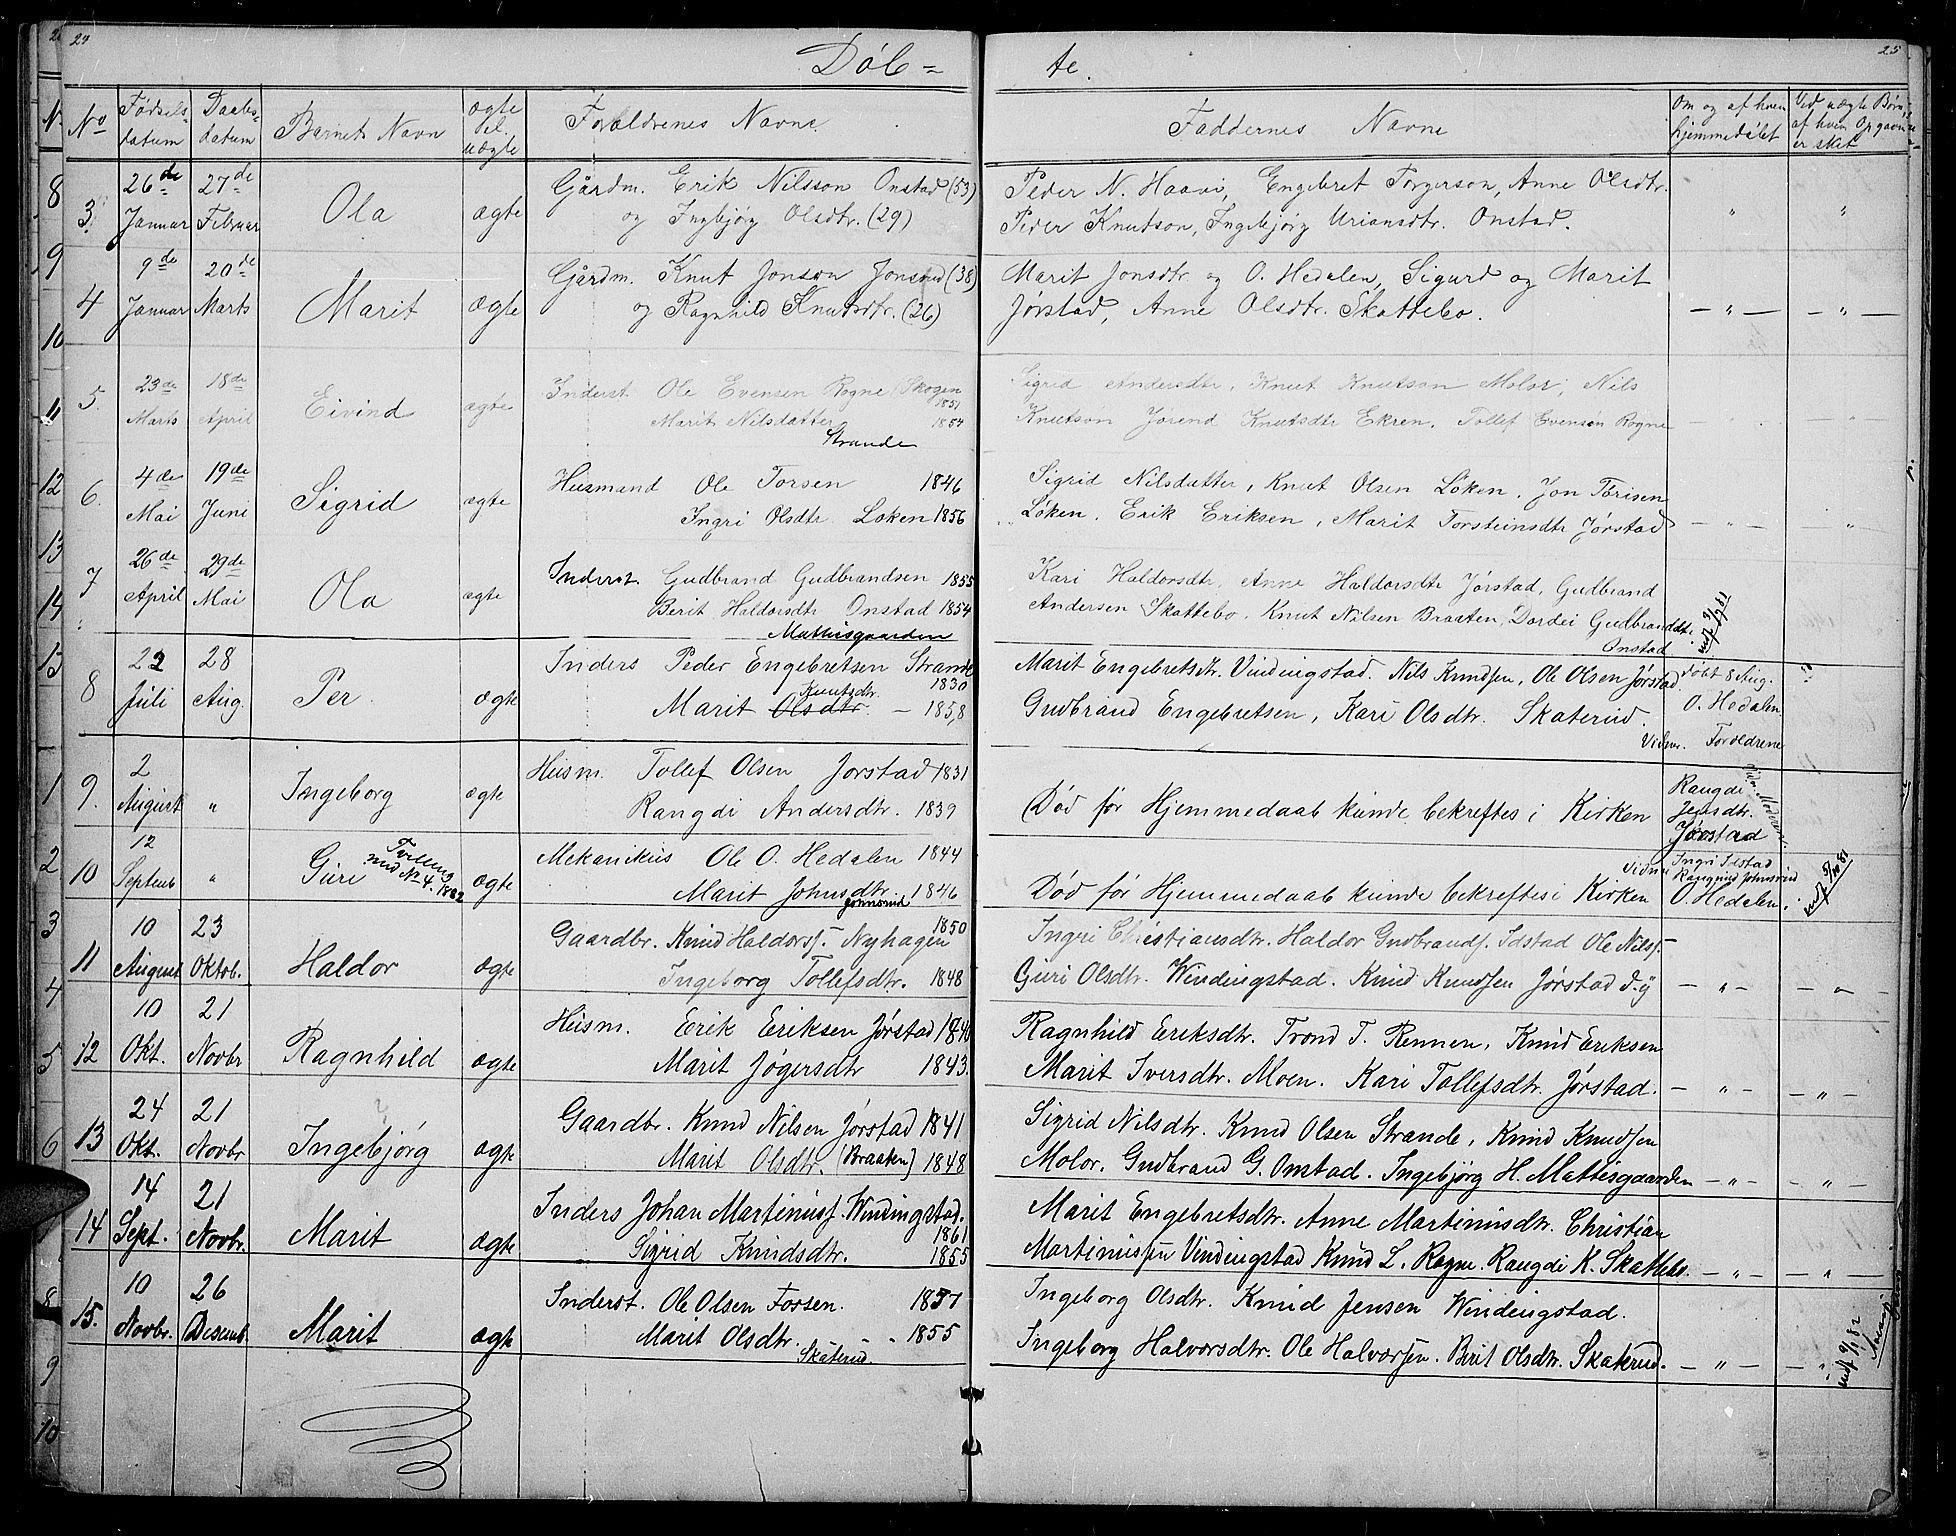 SAH, Øystre Slidre prestekontor, Klokkerbok nr. 2, 1866-1886, s. 24-25